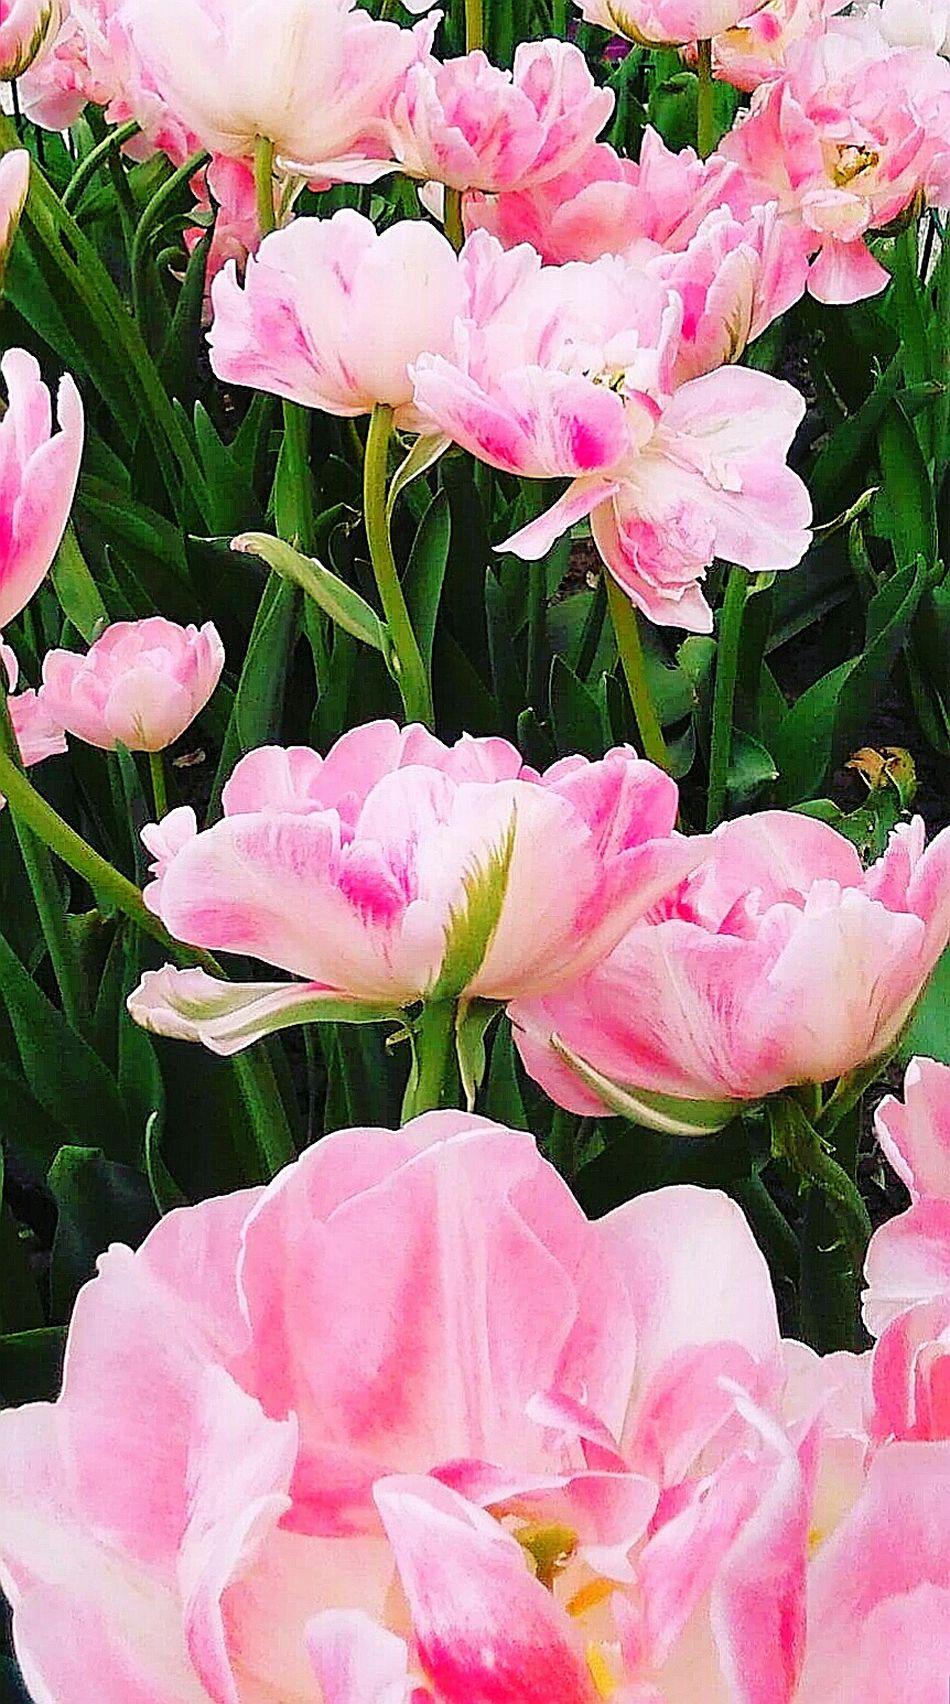 Tulips Pink Tulips Pink Flowers Pink Flower White Pink Green White Pink Green Flower Stems Flower Freshness Close-up Nature Flower Head